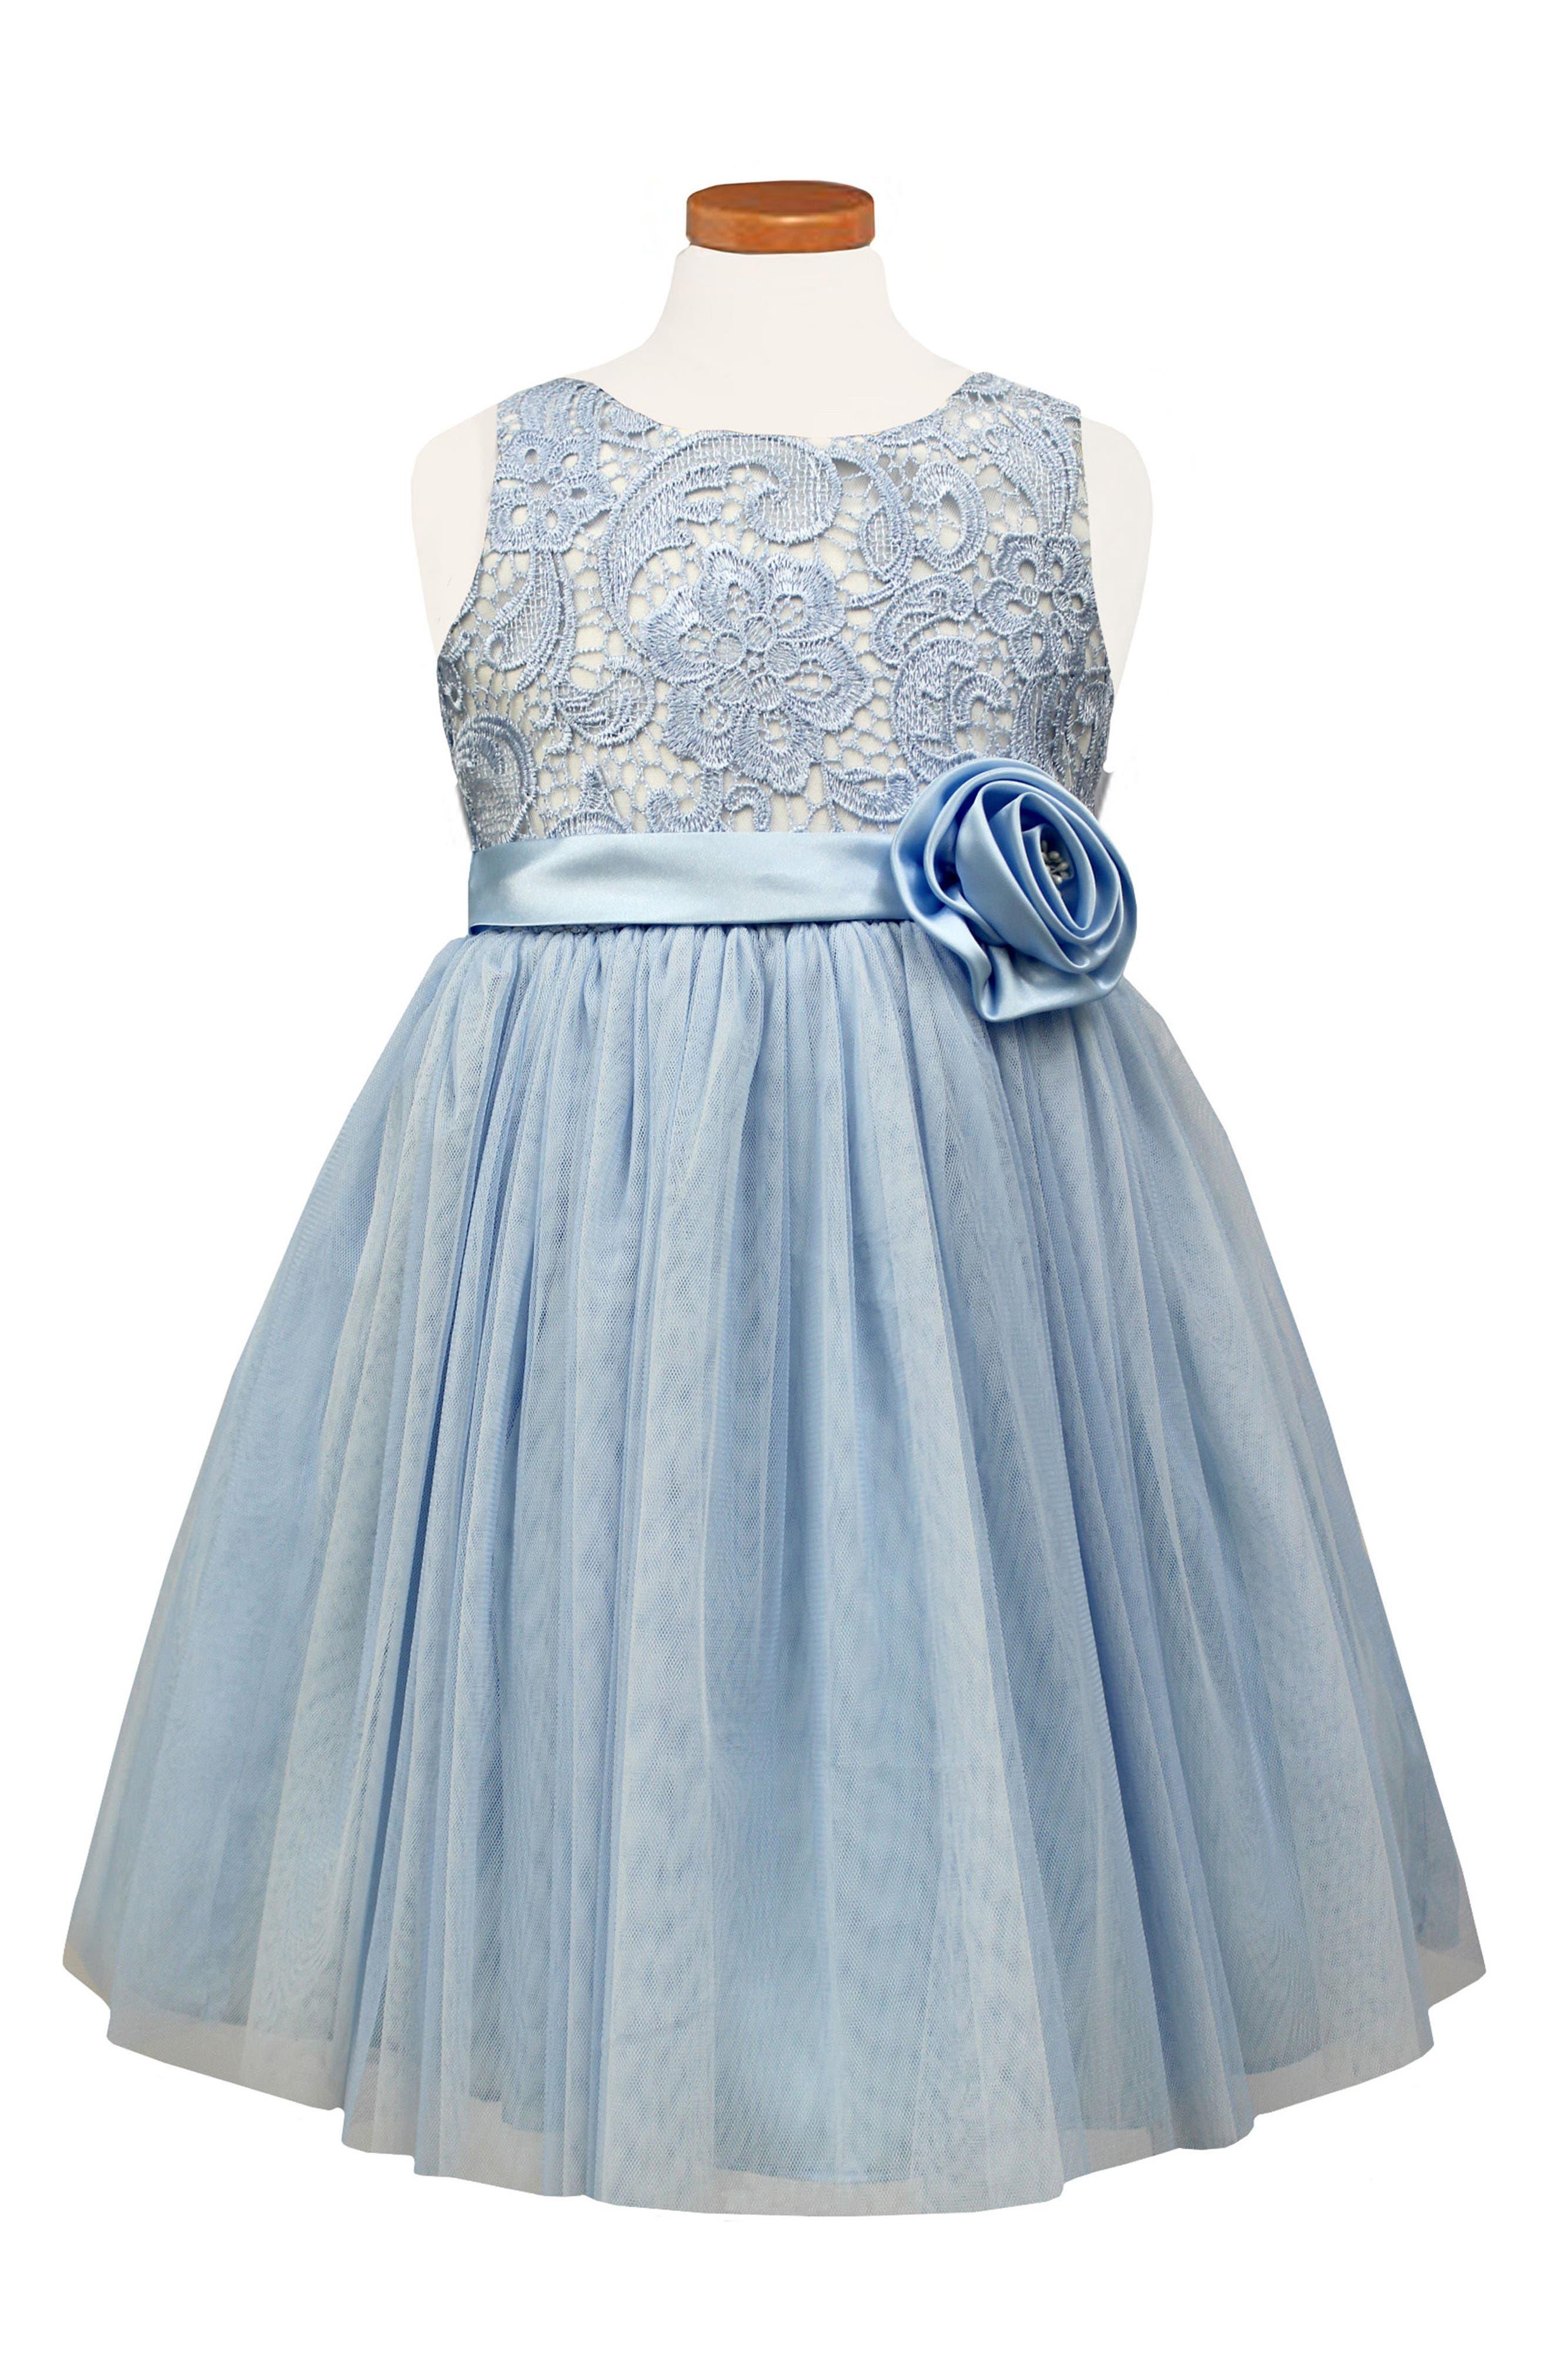 Main Image - Sorbet Floral Lace Ballerina Dress (Toddler Girls & Little Girls)